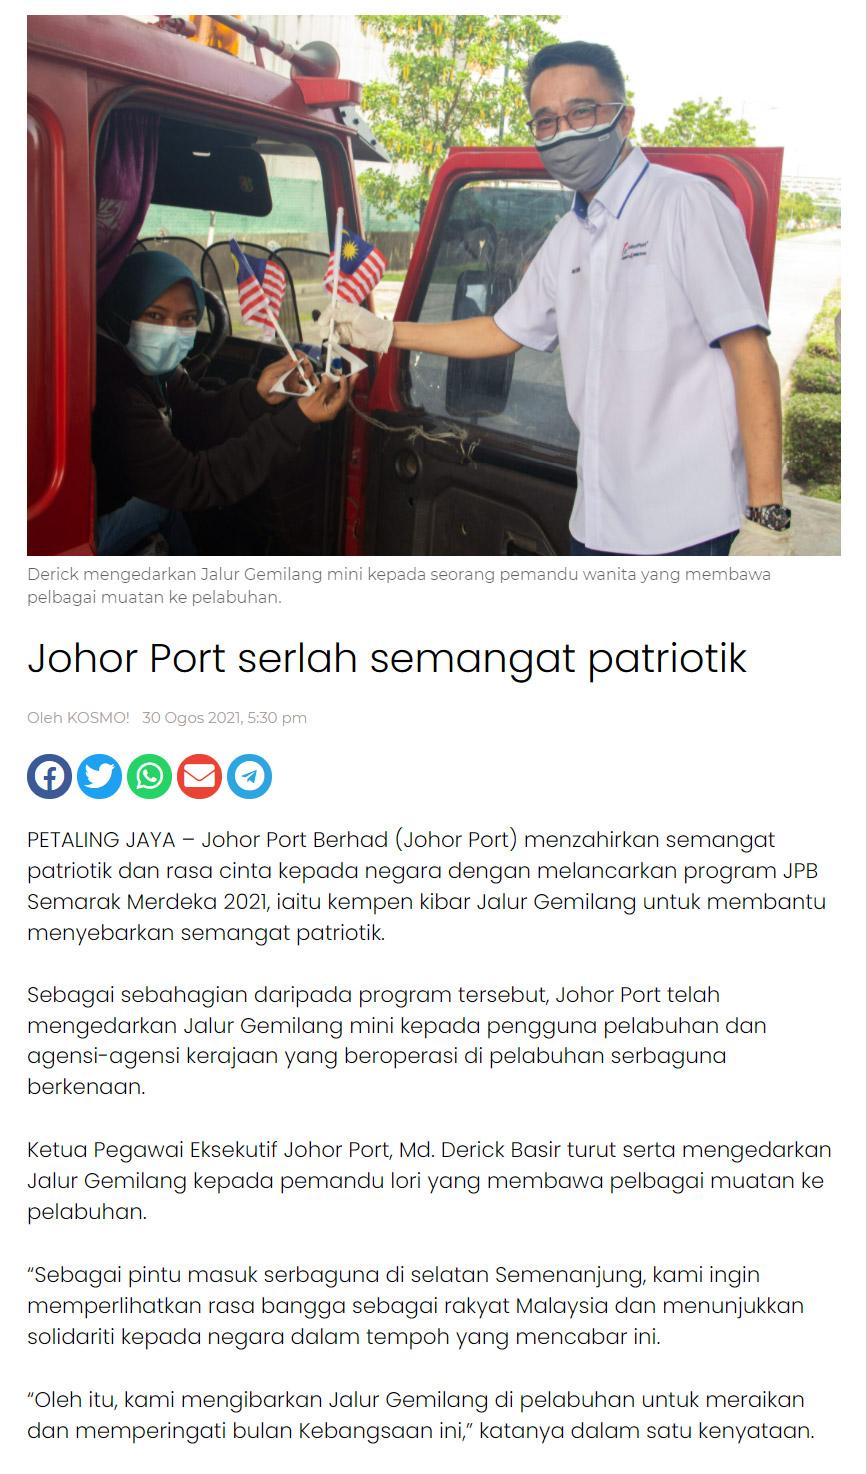 Johor Port serlah semangat patriotik